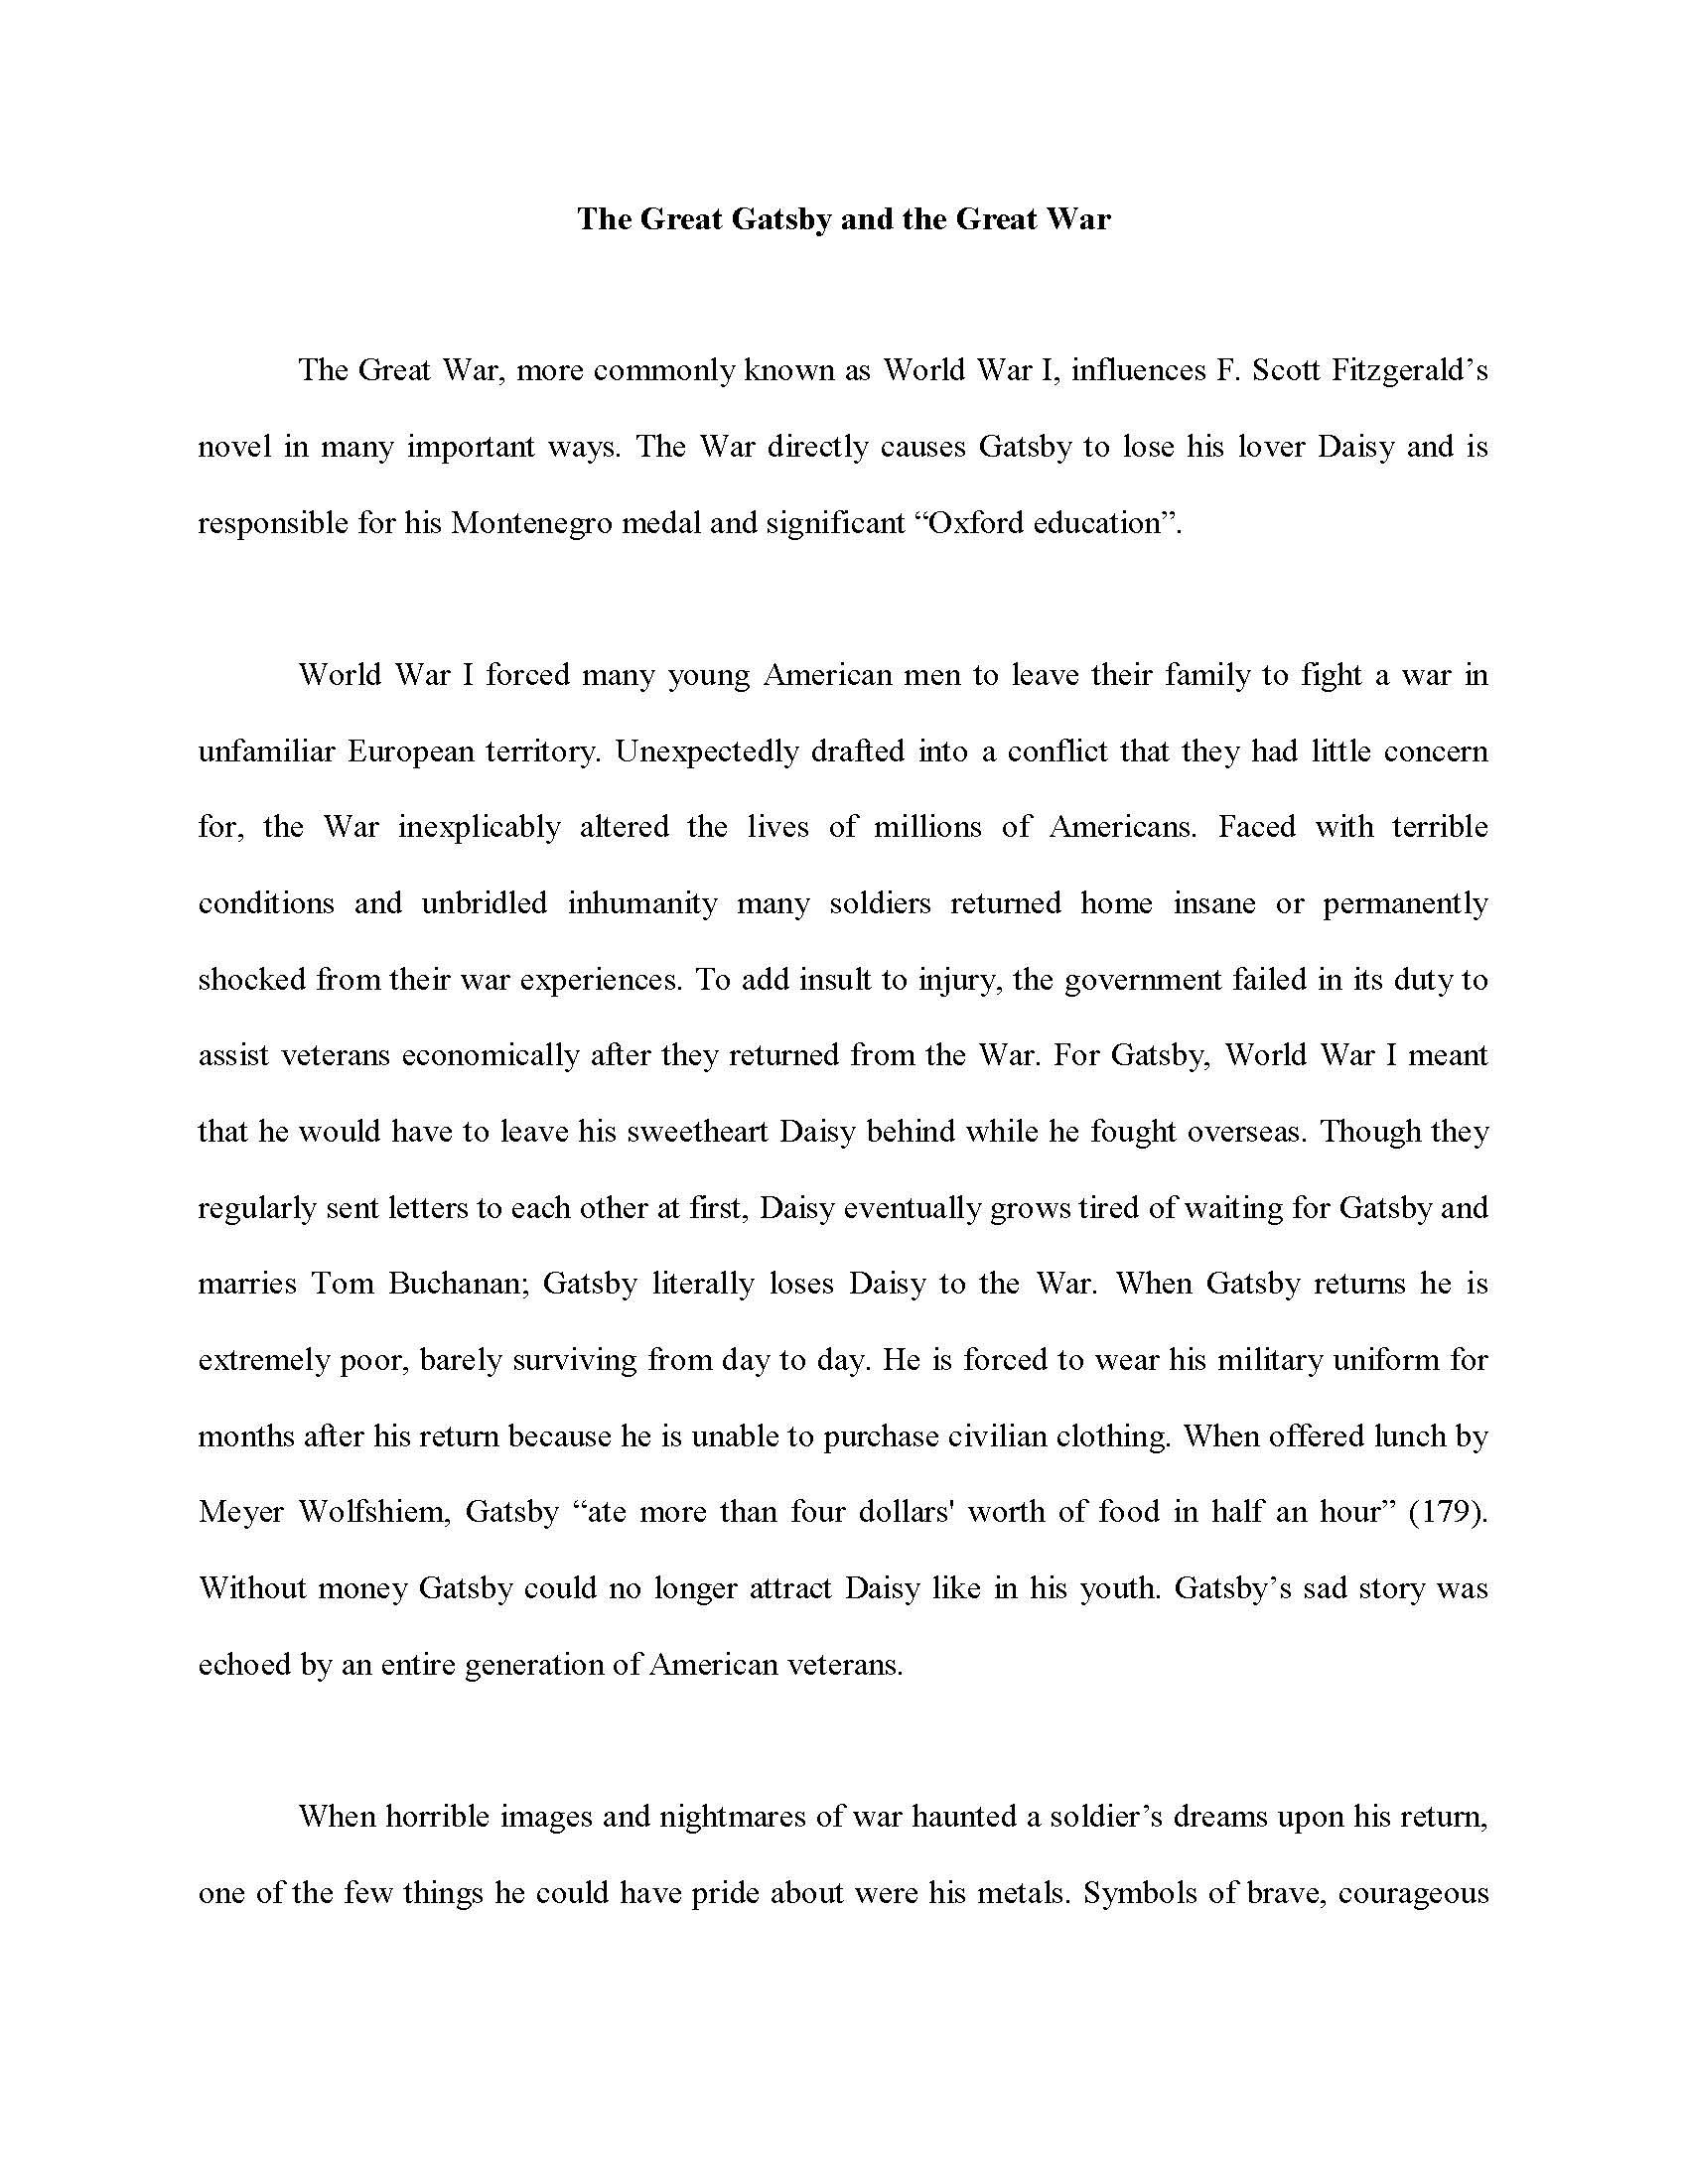 002 Essay Example Informative Sample Good Imposing Topics Great Full